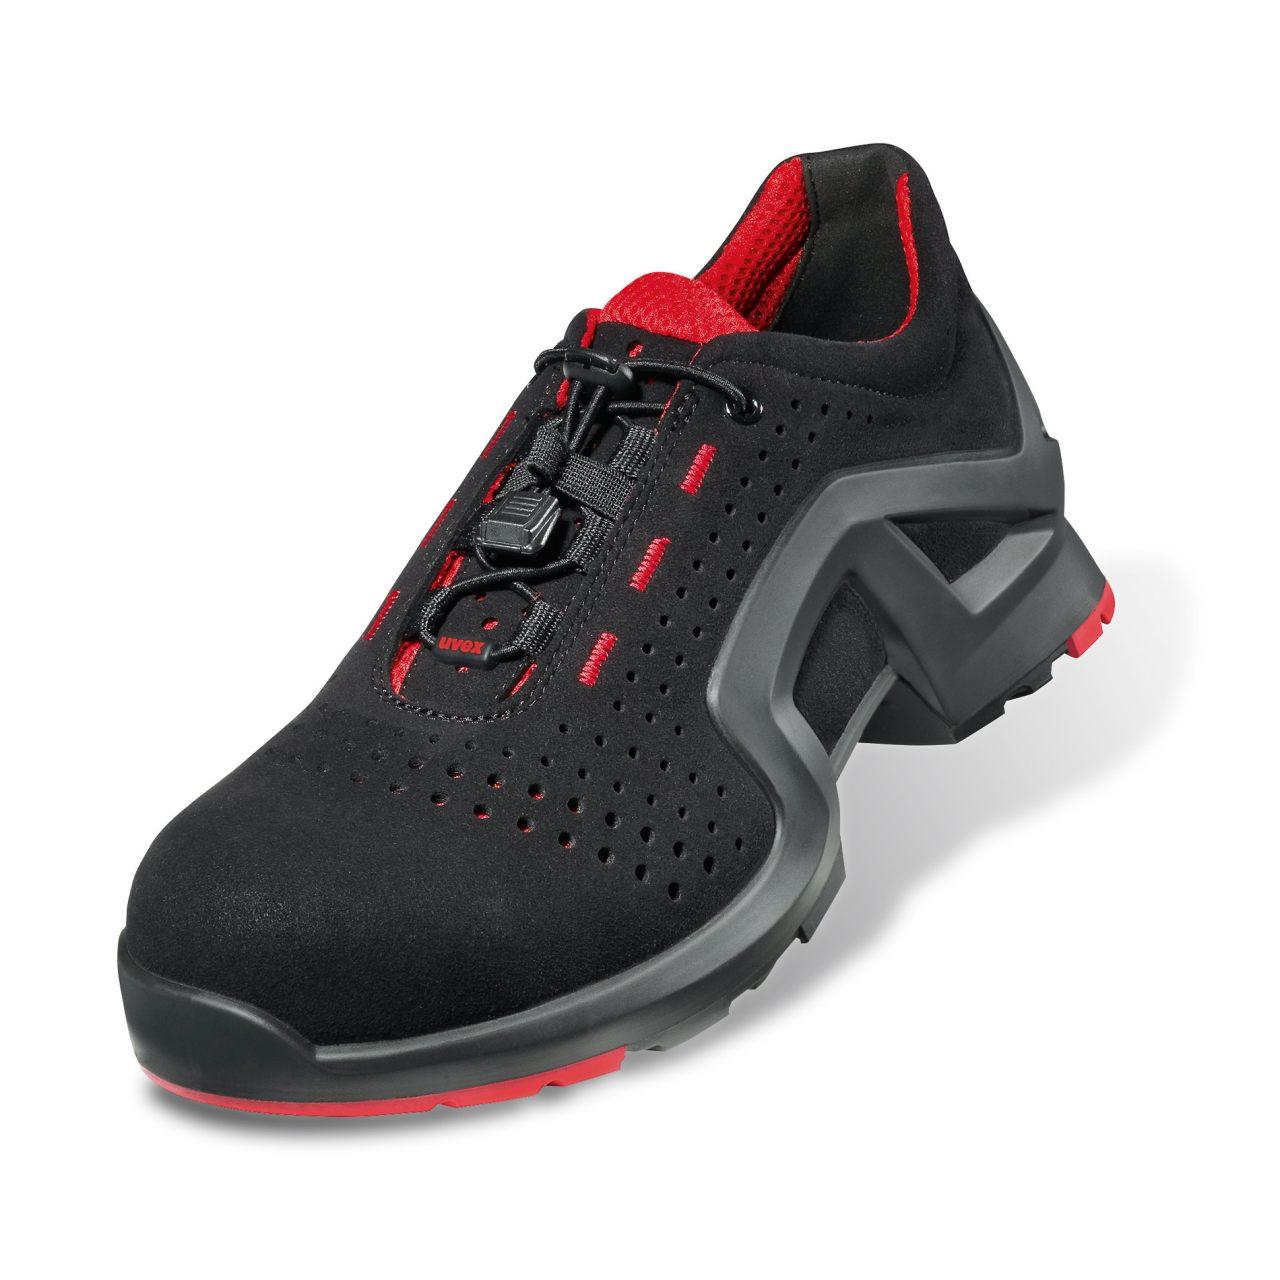 8cb3e0c57 Shoe Trainer Black Red S1 Src 8512.8 Uvex